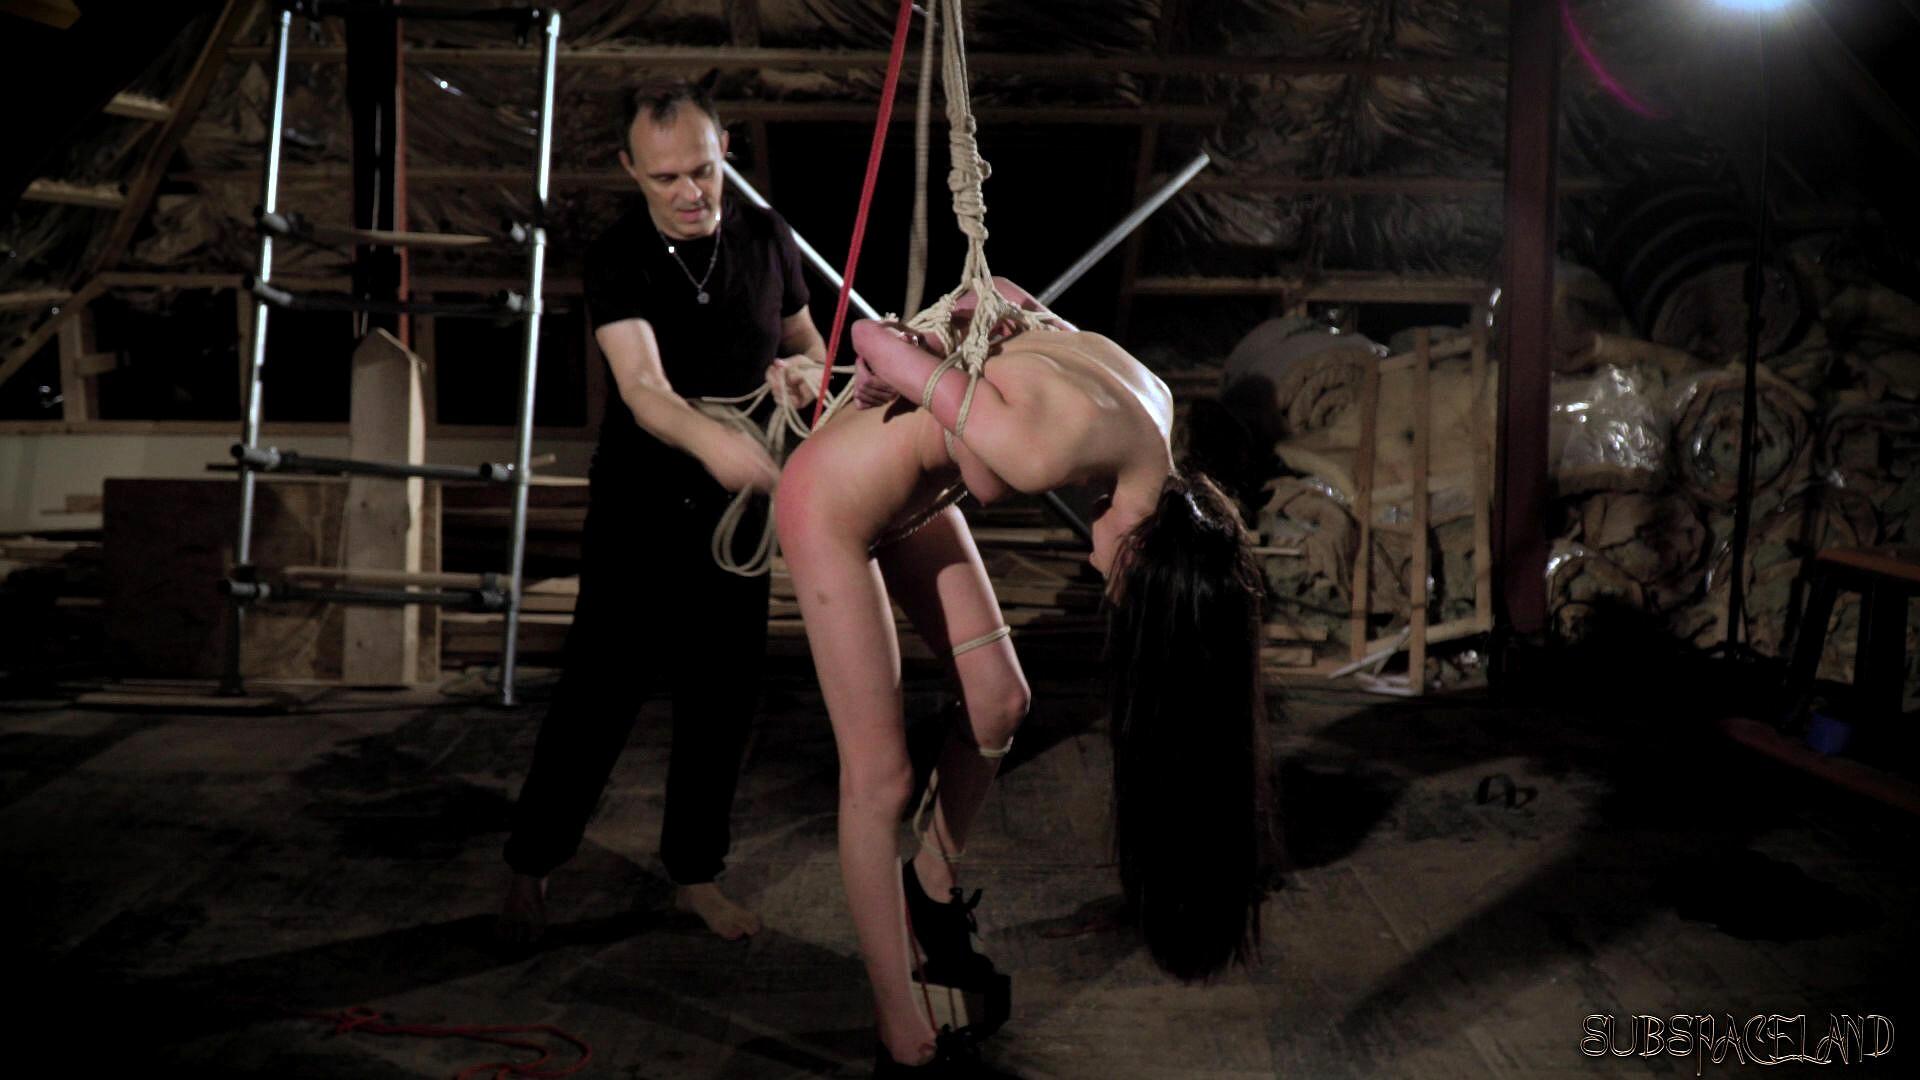 Clit Orgasm BDSM BDSM Porn